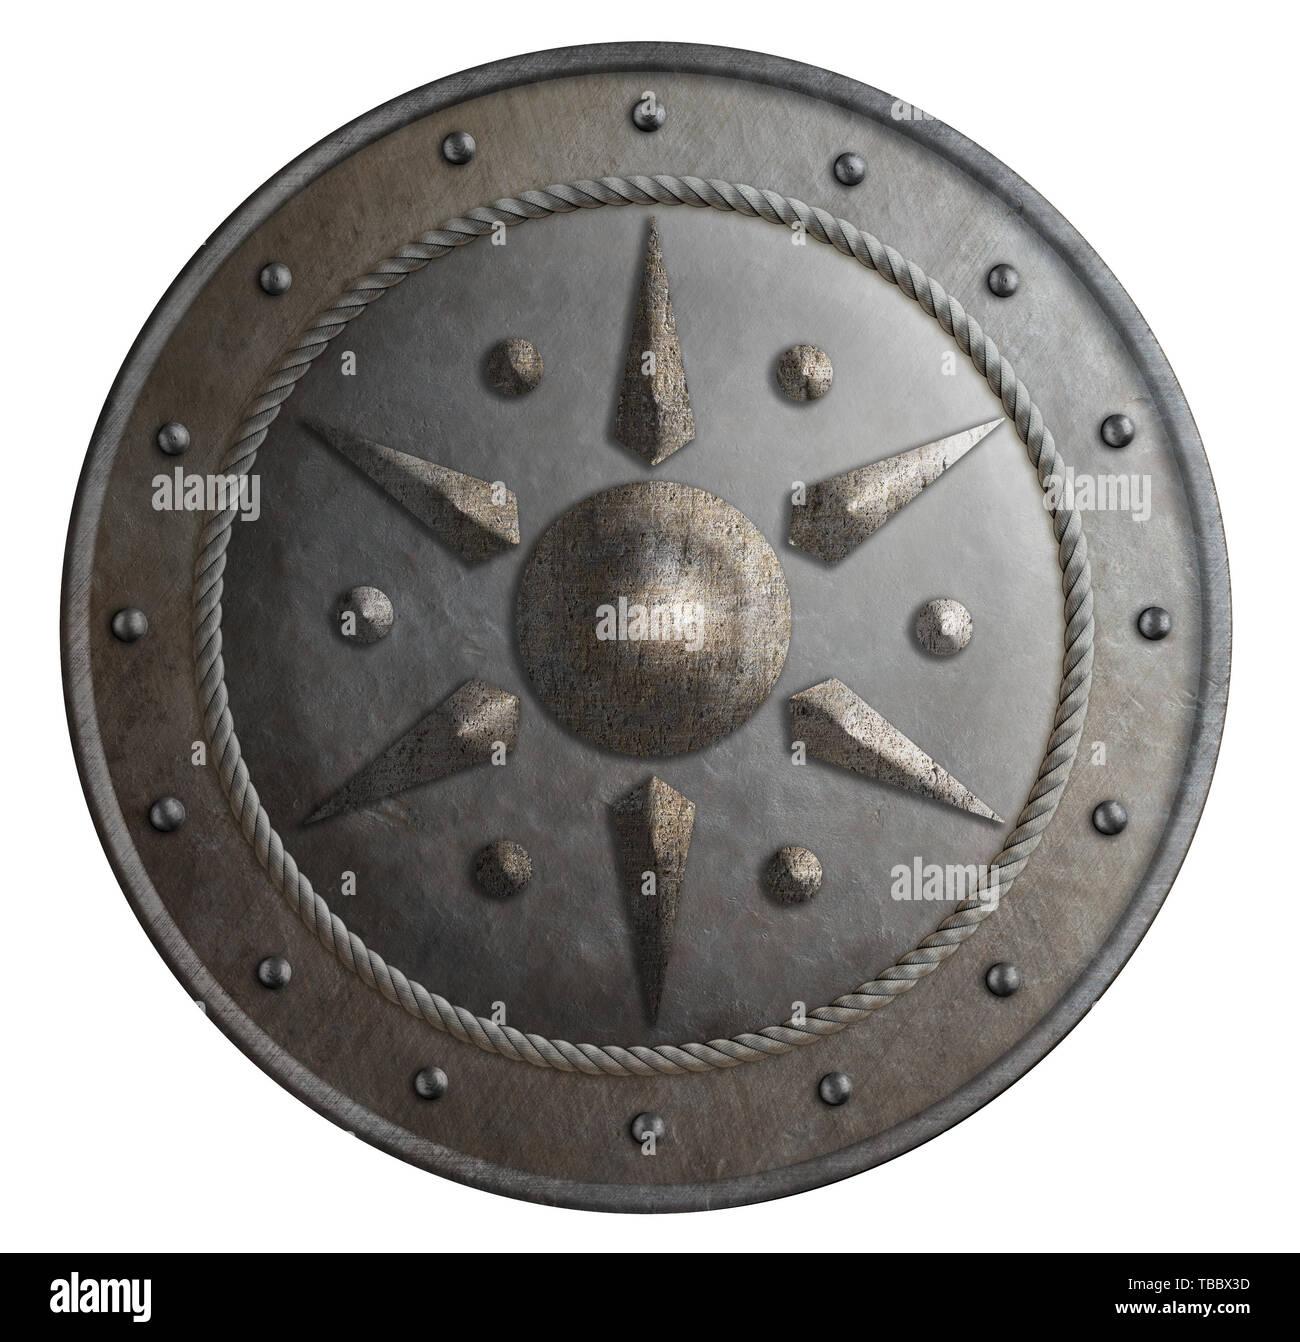 Escudo De metal redondo aislado ilustración 3d Imagen De Stock